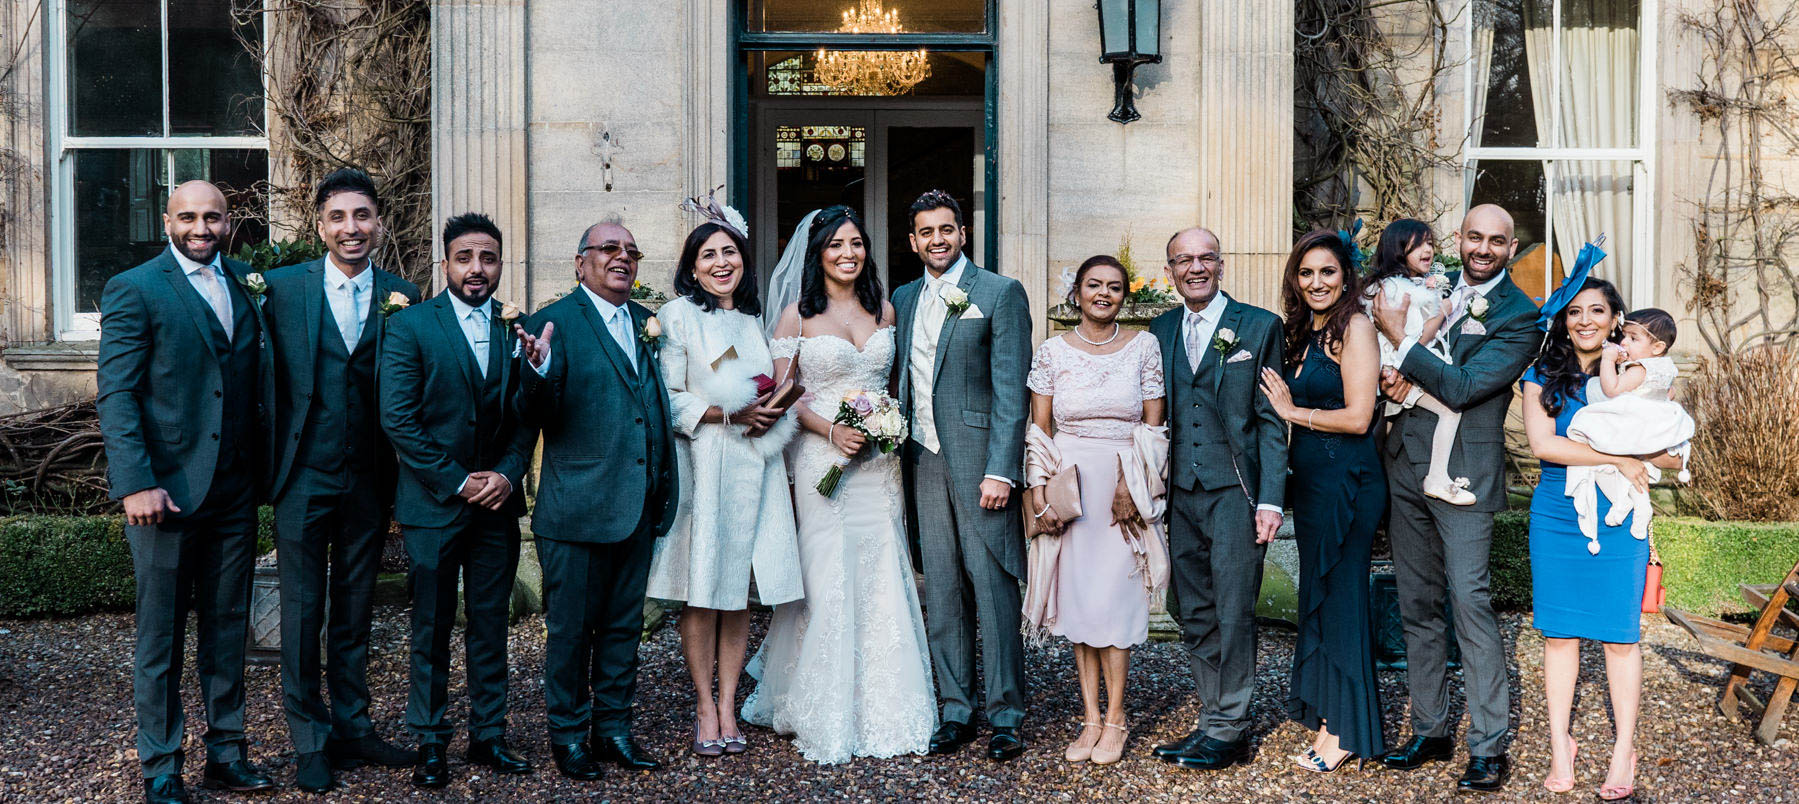 Eshott Hall Wedding Photographer   wedding formals